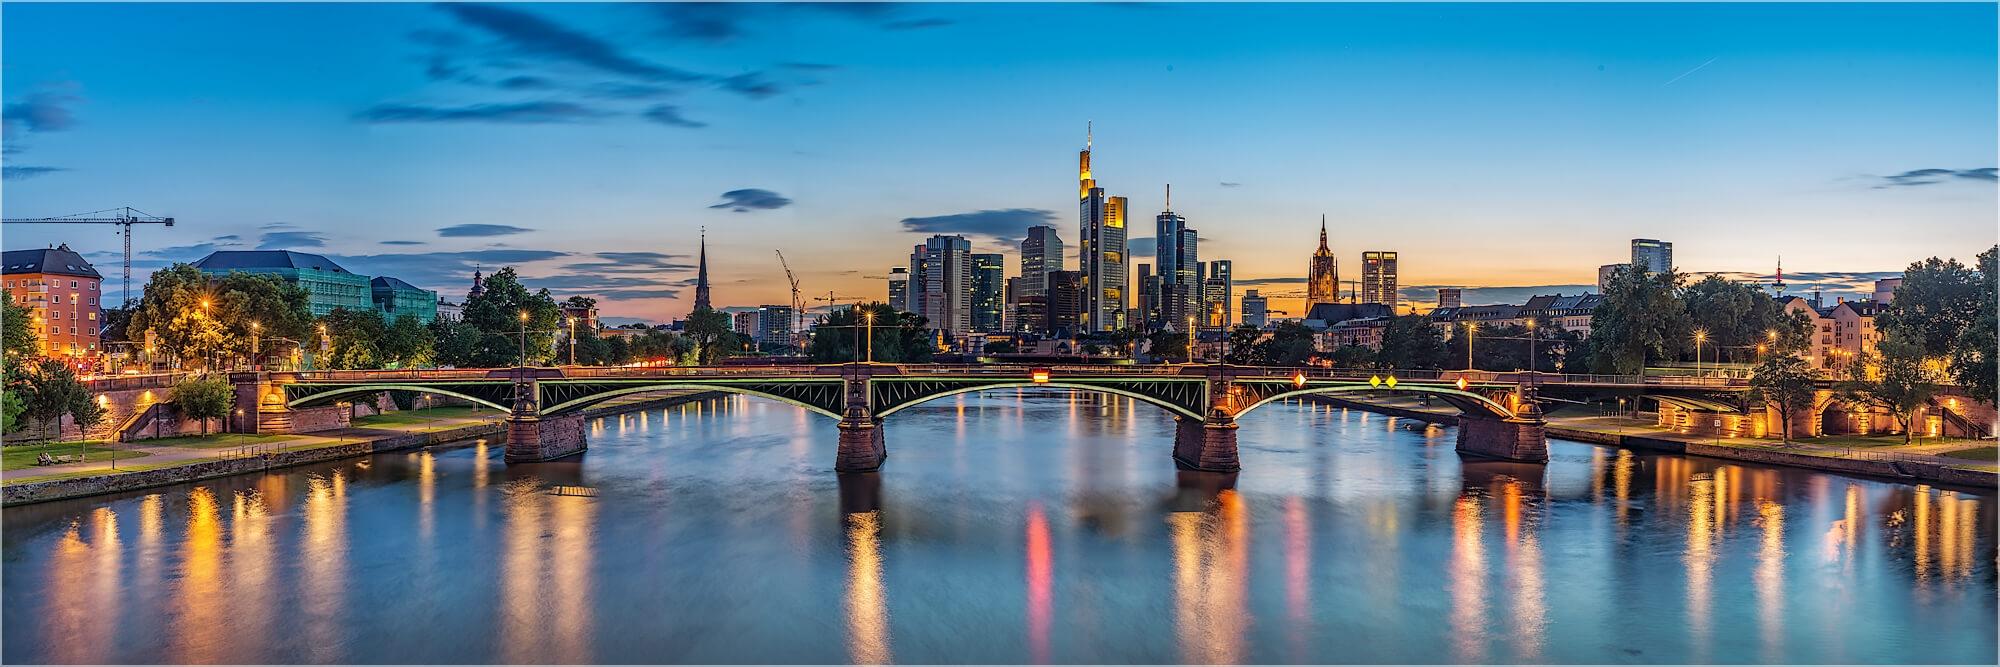 Panoramafoto Sonnenuntergang Frankfurter Skyline